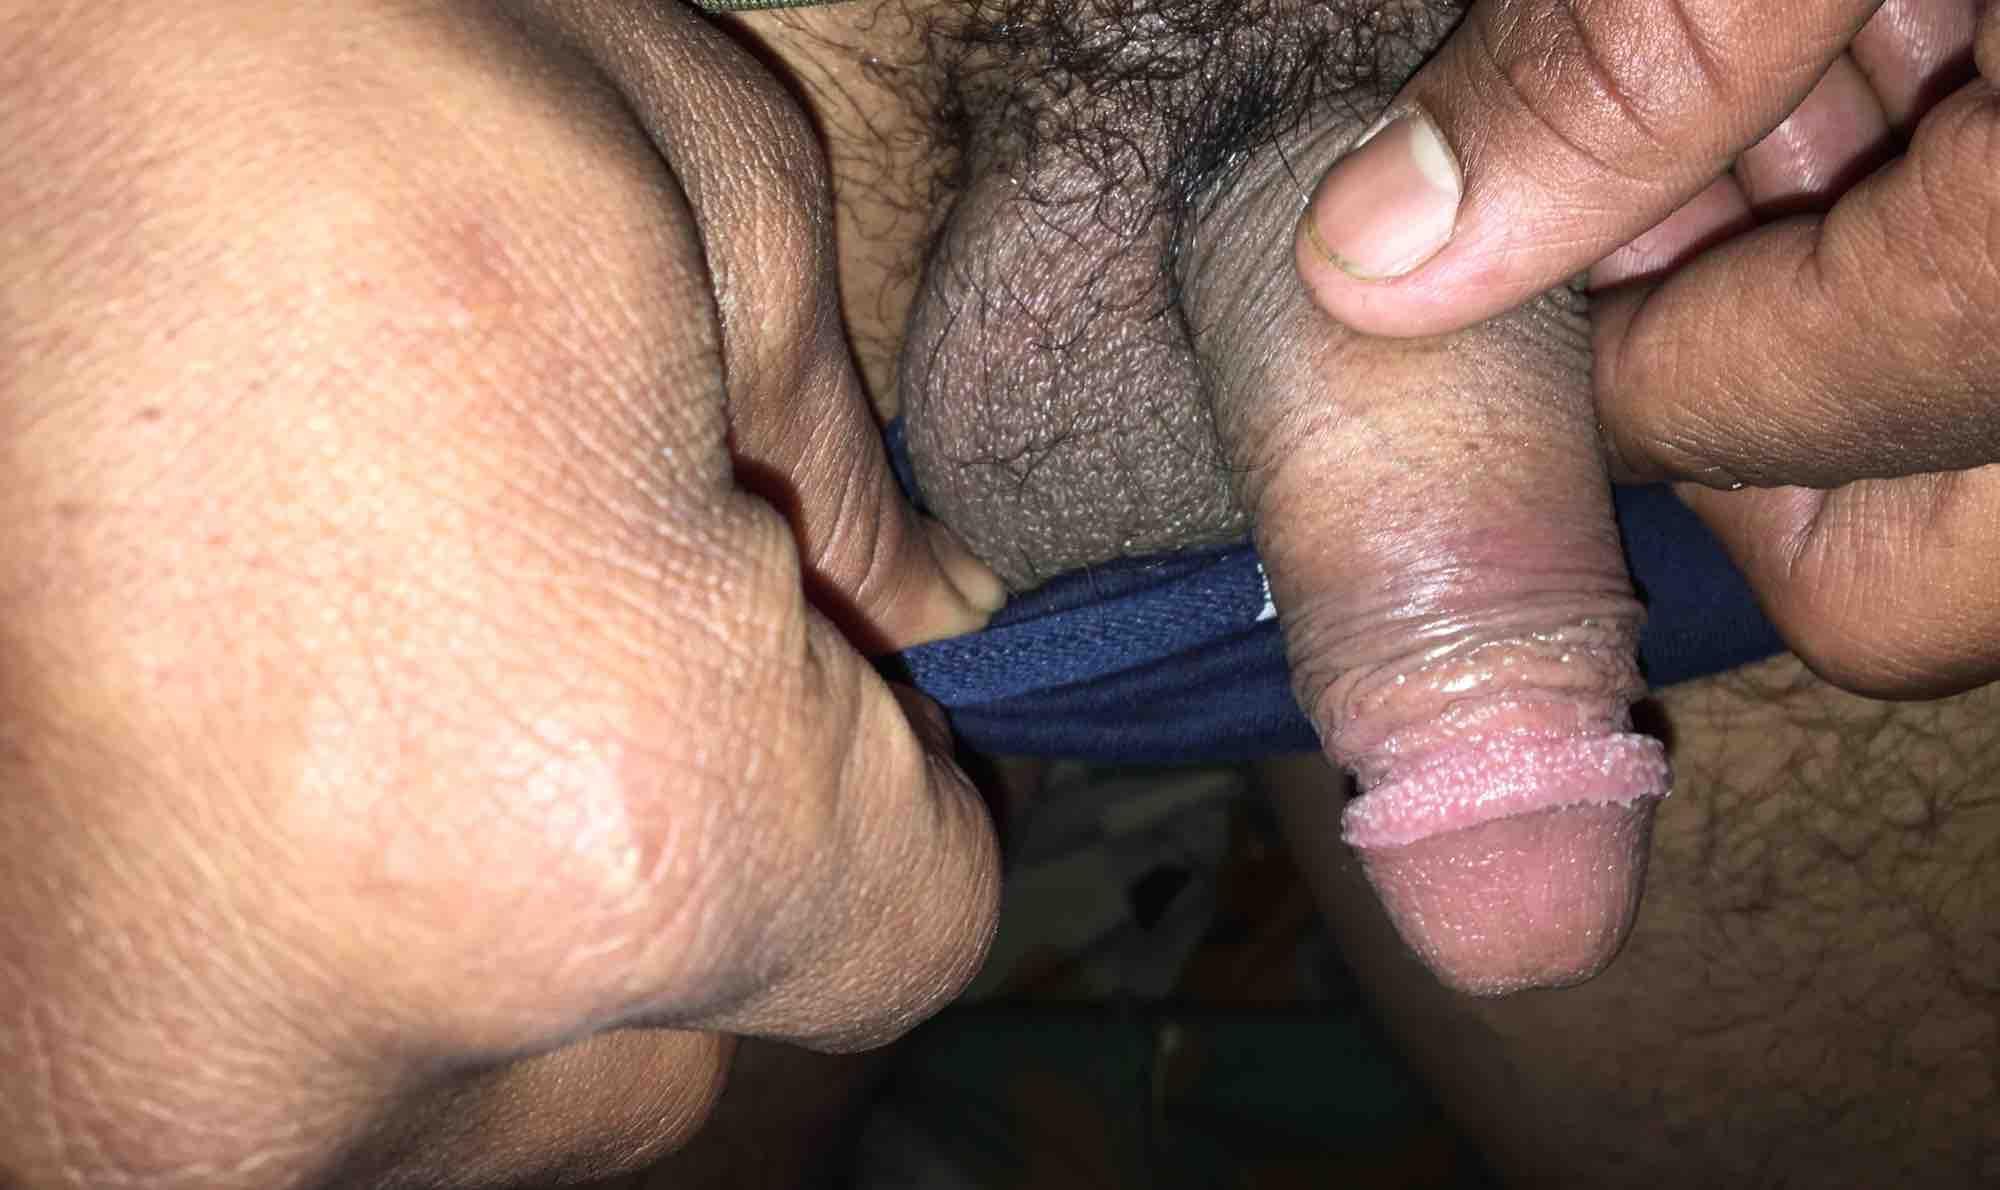 https://media.curofy.com/96343.9acf519f80371231952d71109736dad8.jpg